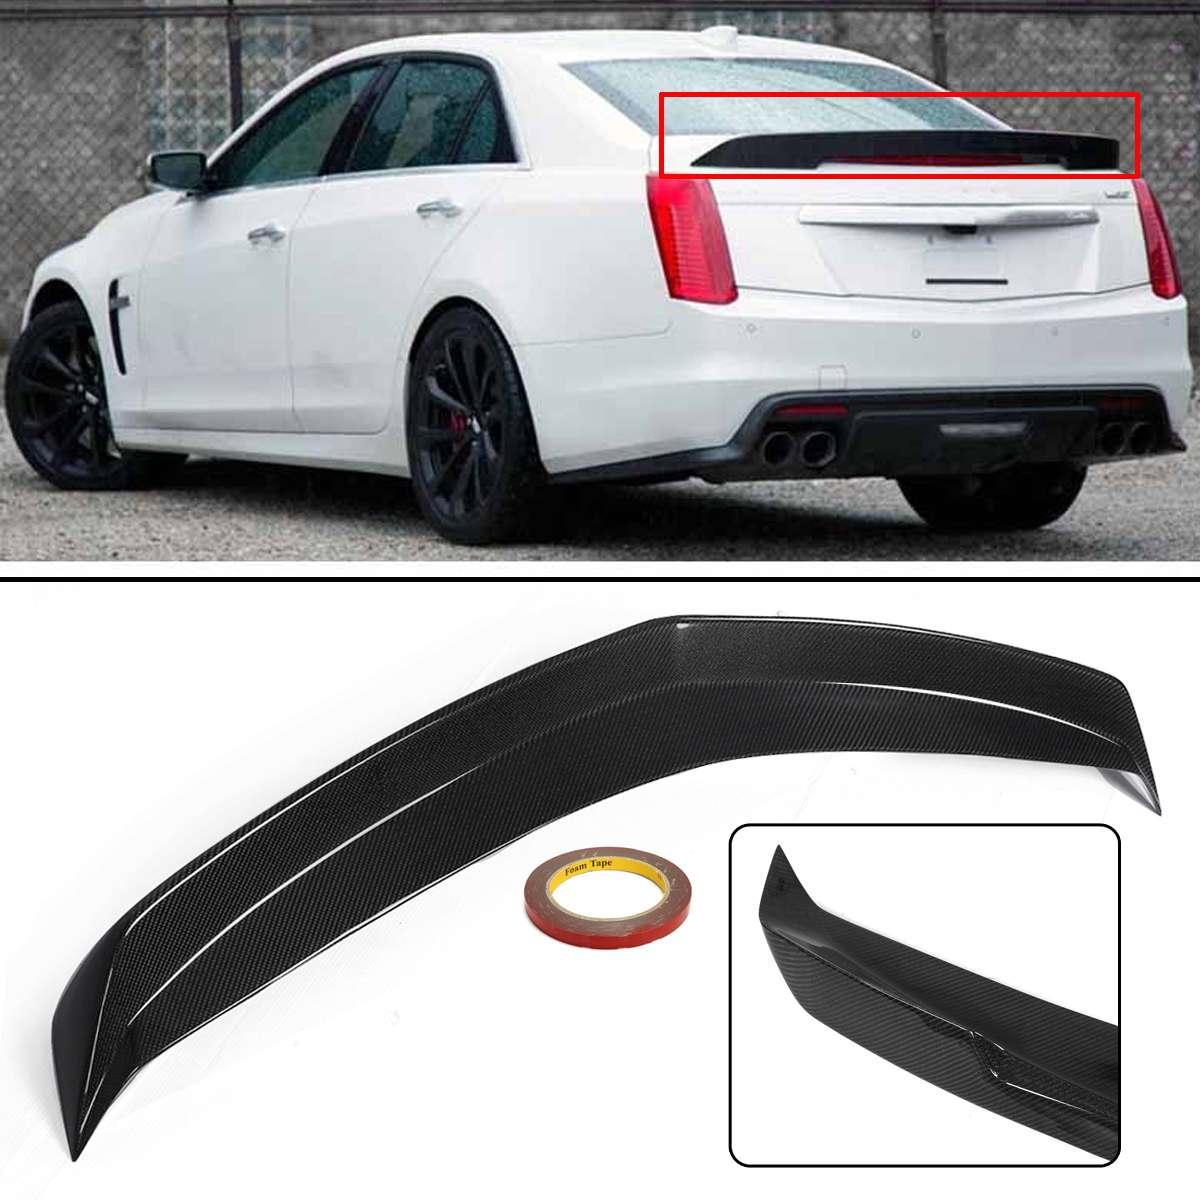 Pacote de Fibra De carbono Tronco Lid Spoiler Traseiro Asa Lip Asa Spoiler Tampa para Cadillac CTS-V 16-Up